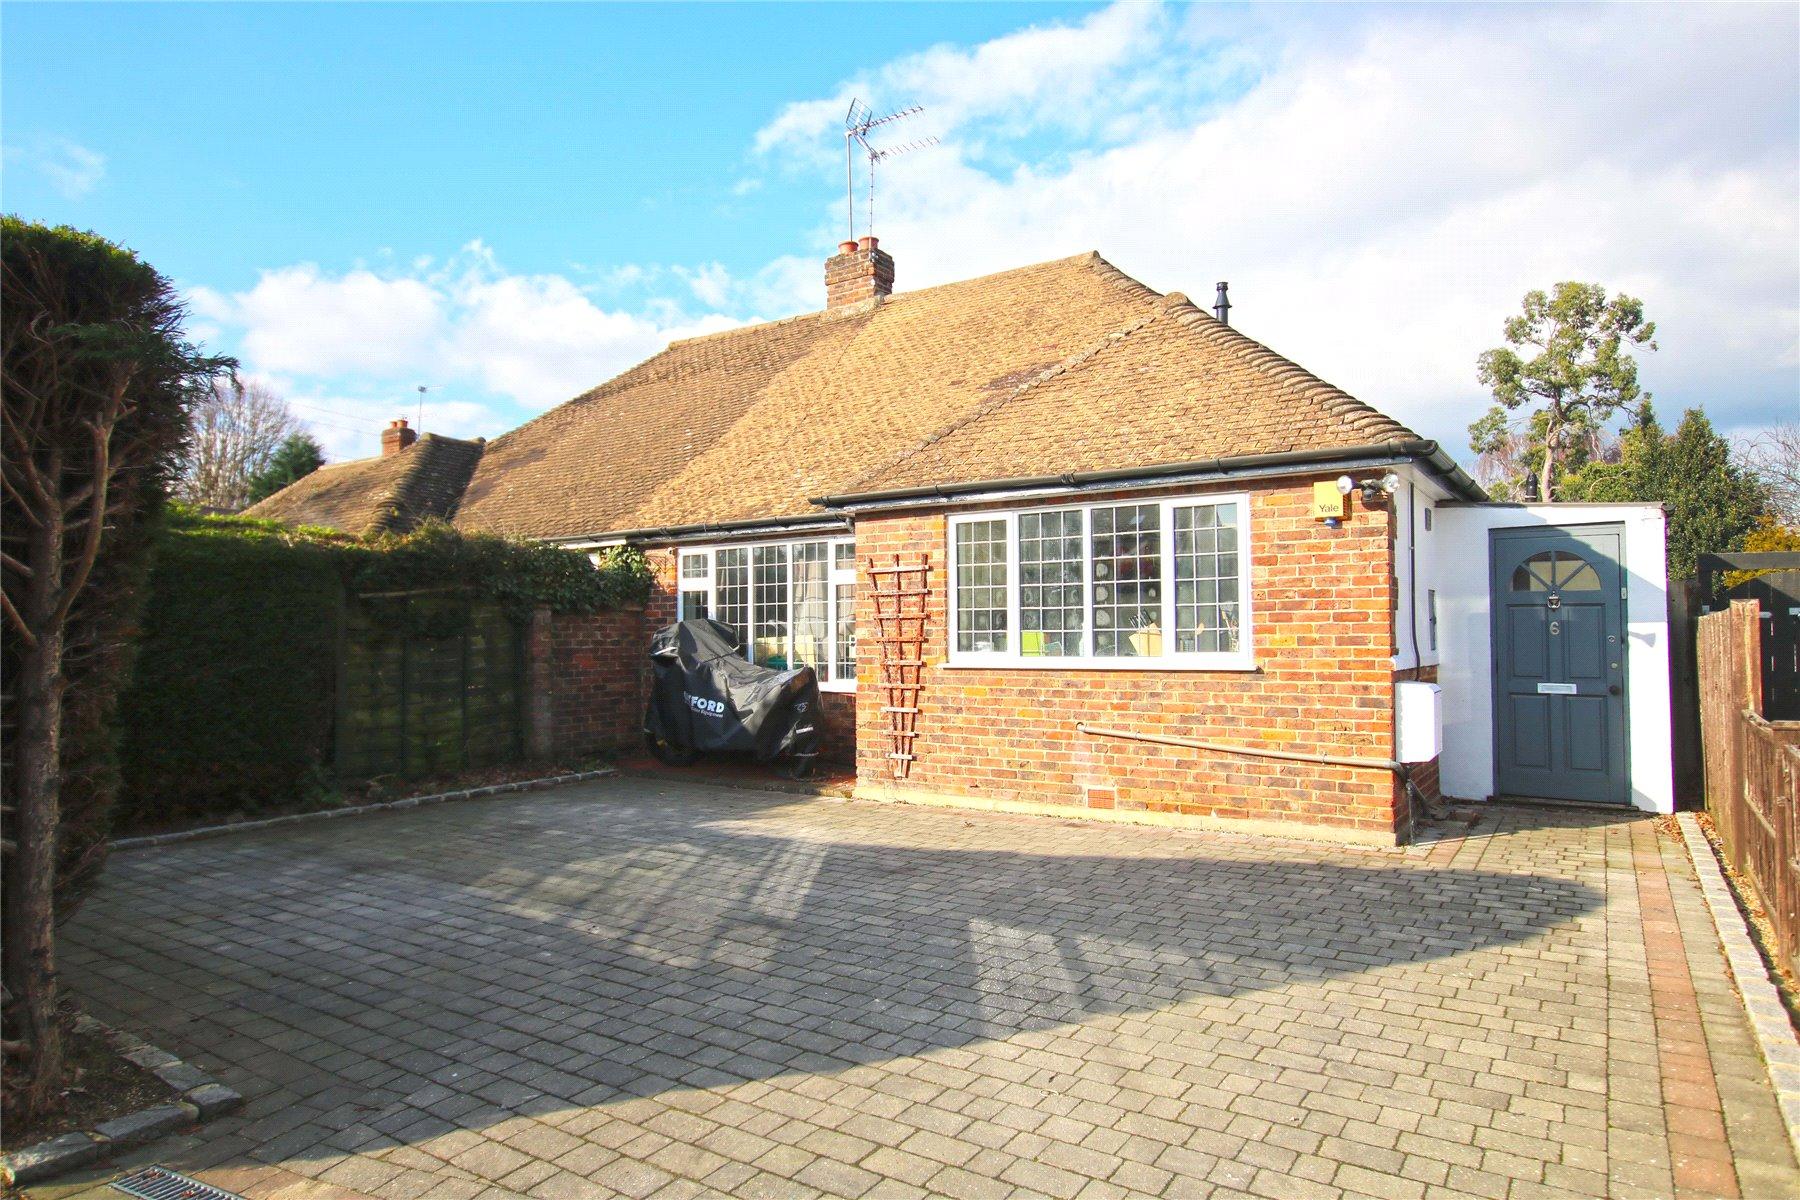 3 Bedrooms Semi Detached Bungalow for sale in Kings Avenue, Byfleet, West Byfleet, Surrey, KT14